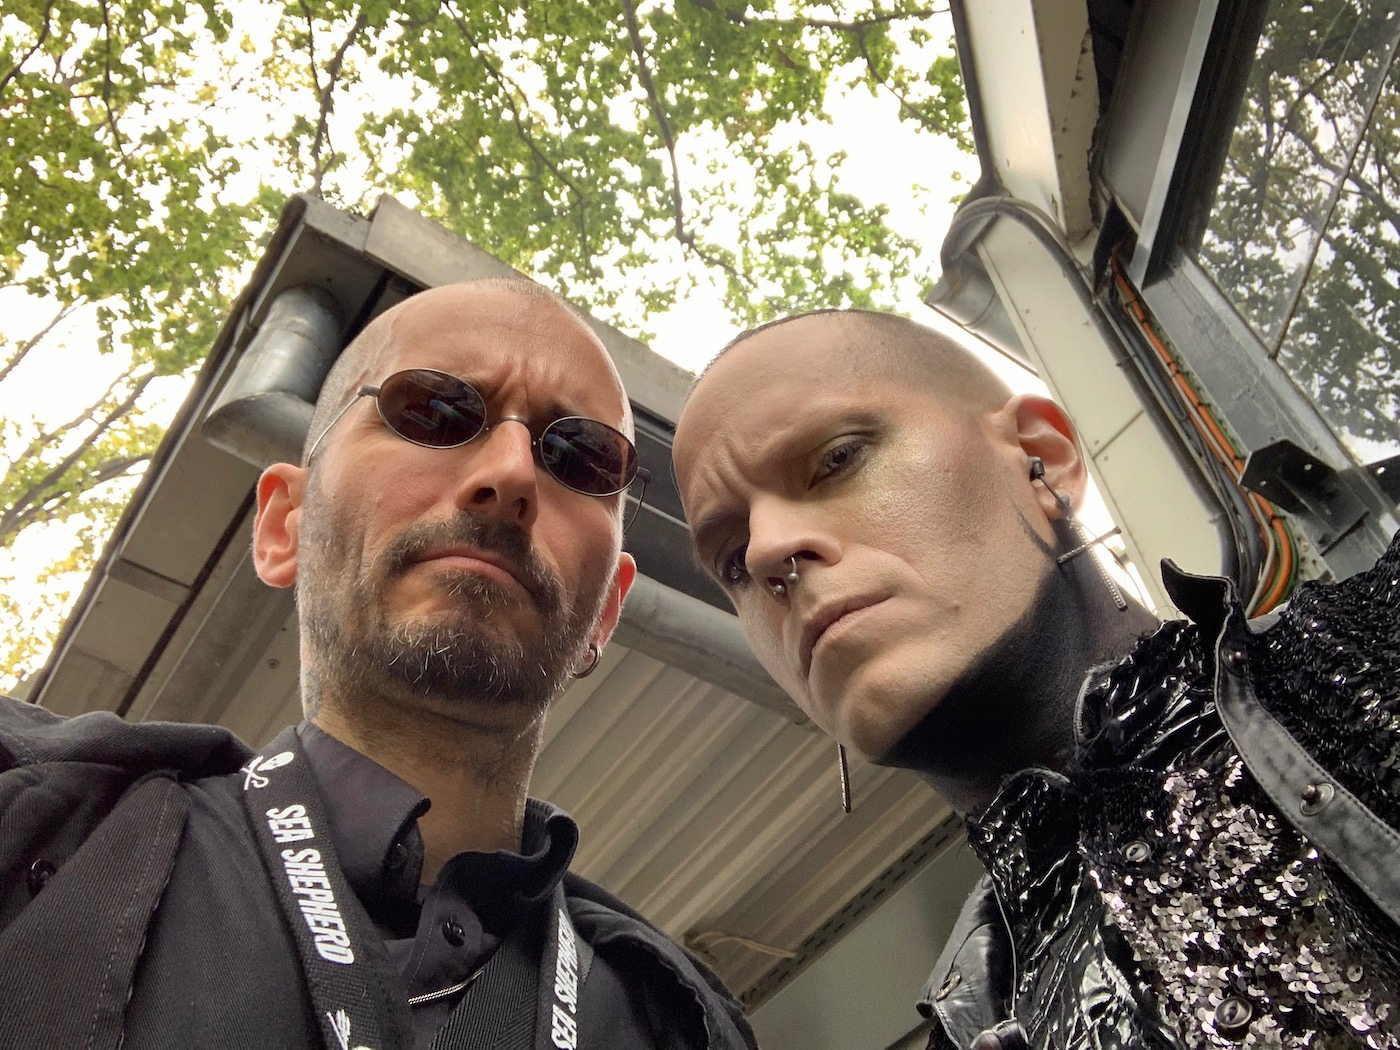 mark_benecke_amphi_festival_koeln_2019 - 58.jpg